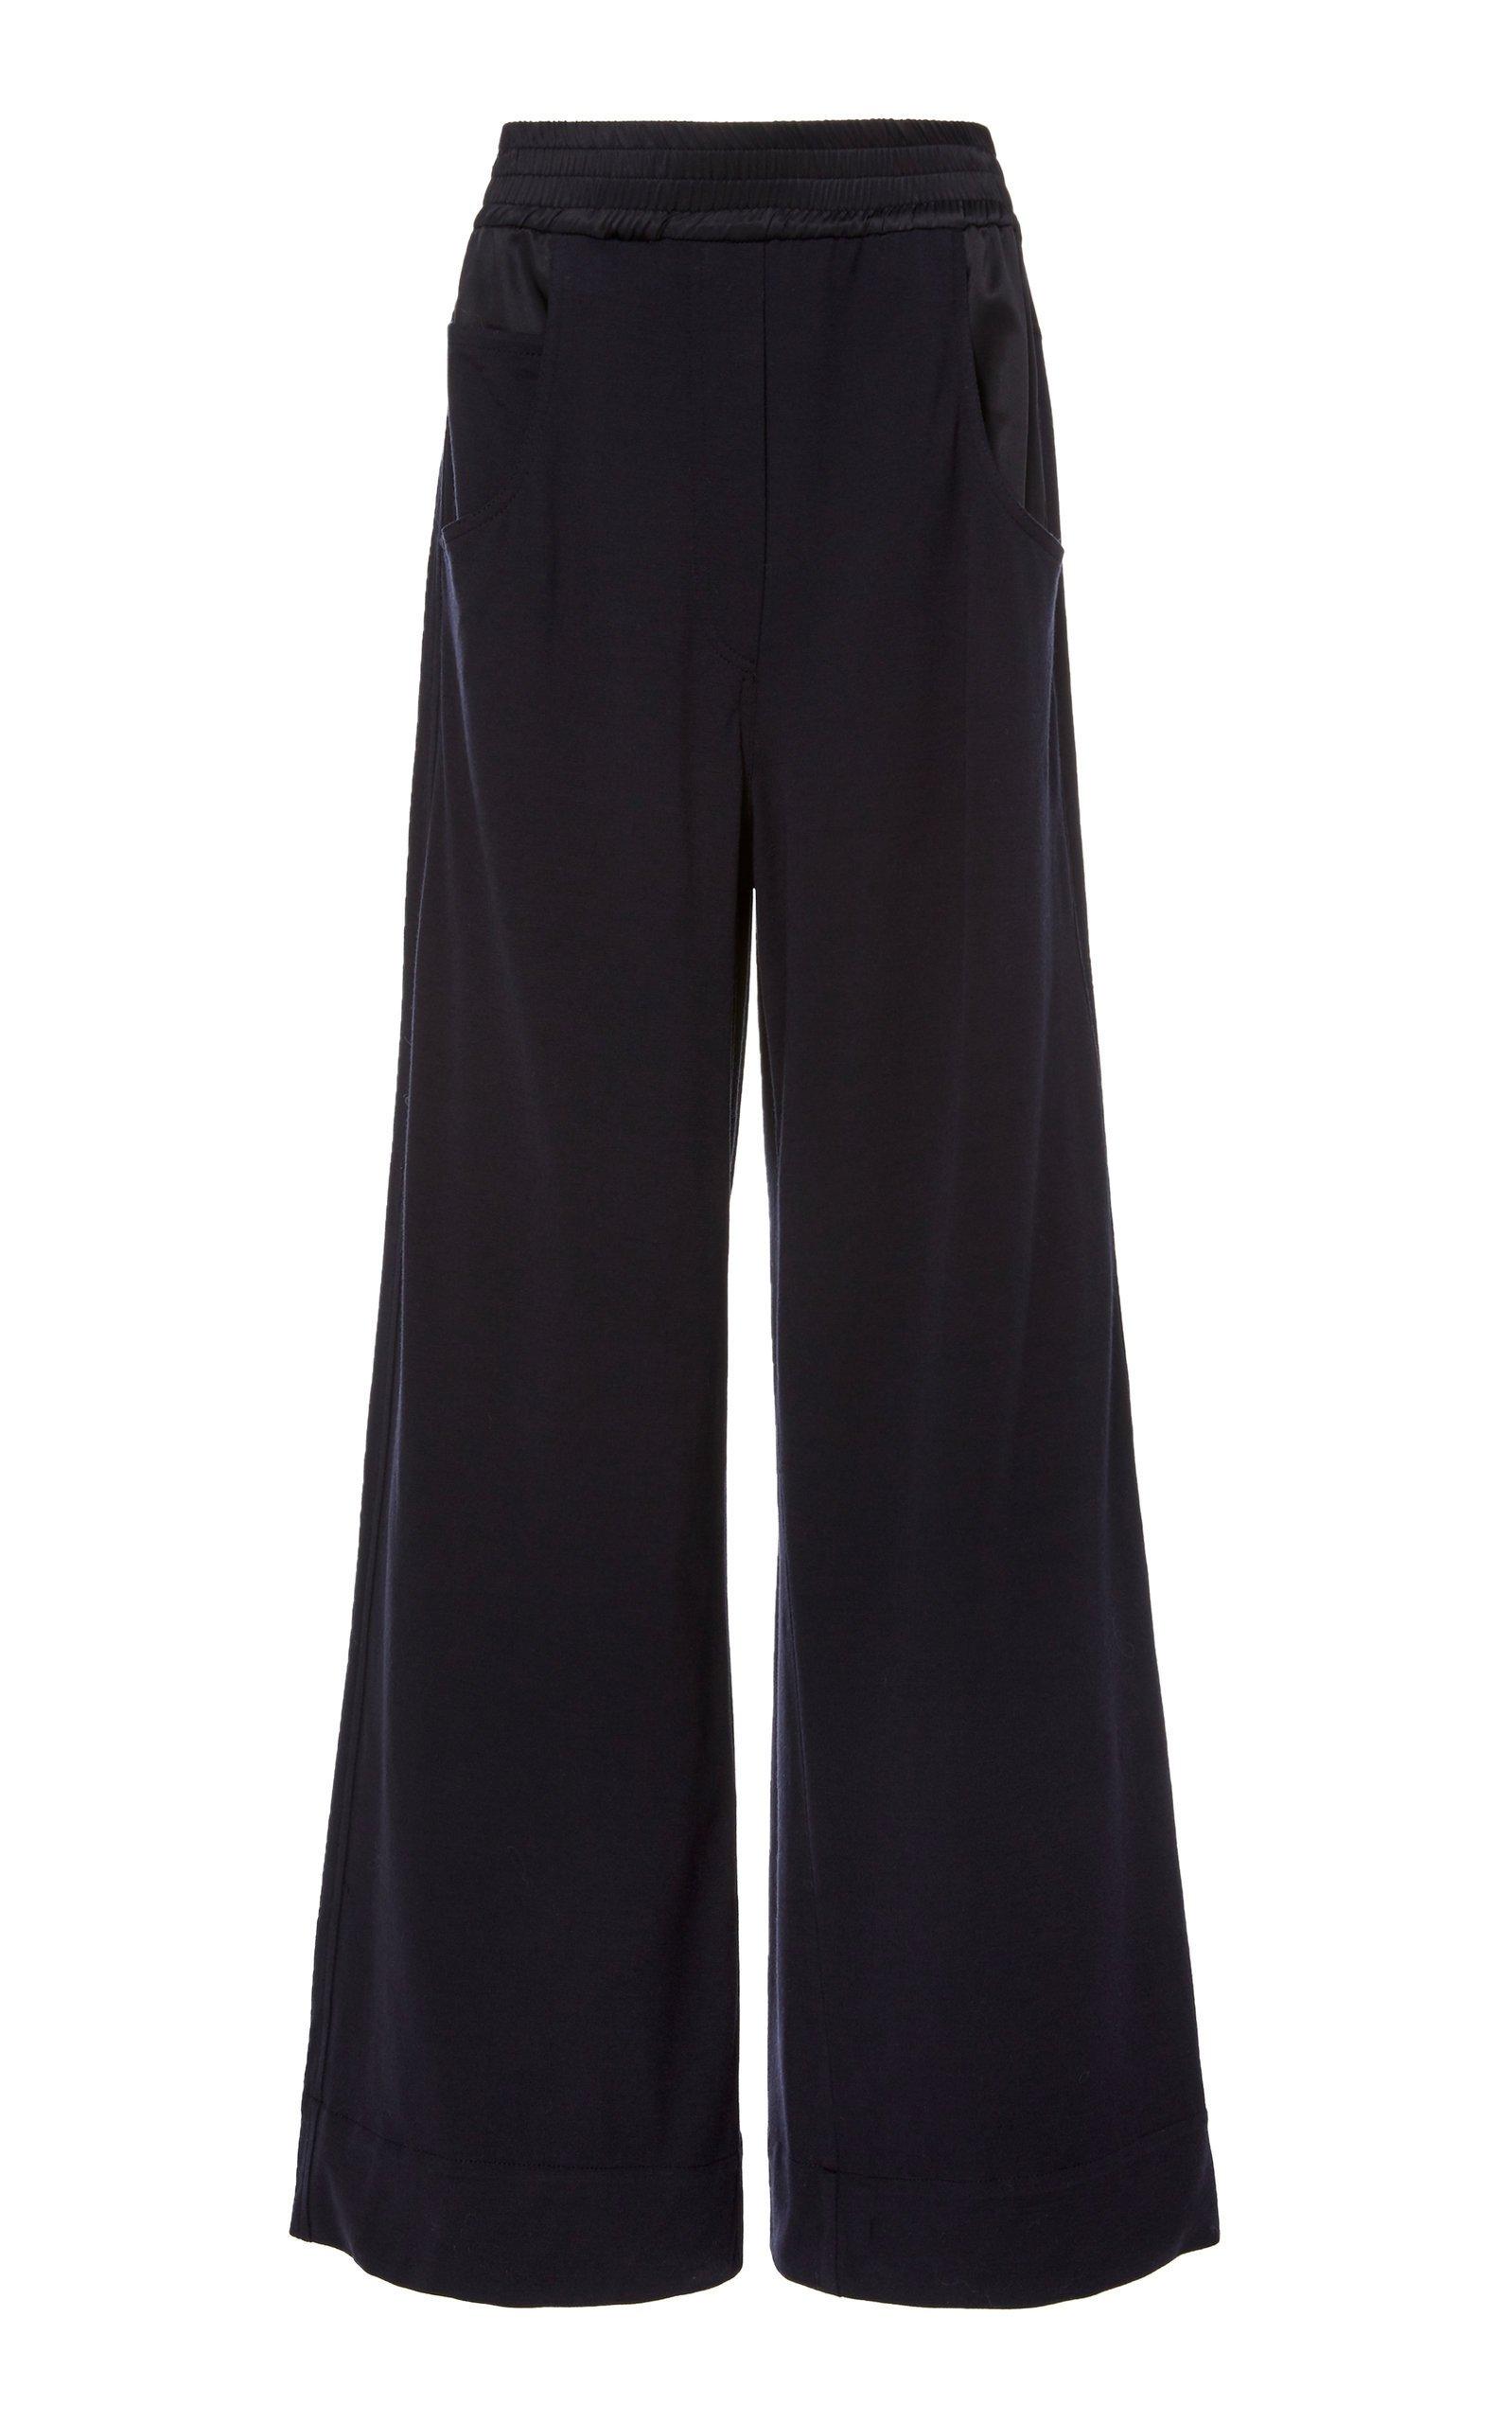 Brunello Cucinelli Satin-Paneled Wool-Blend Wide-Leg Pants